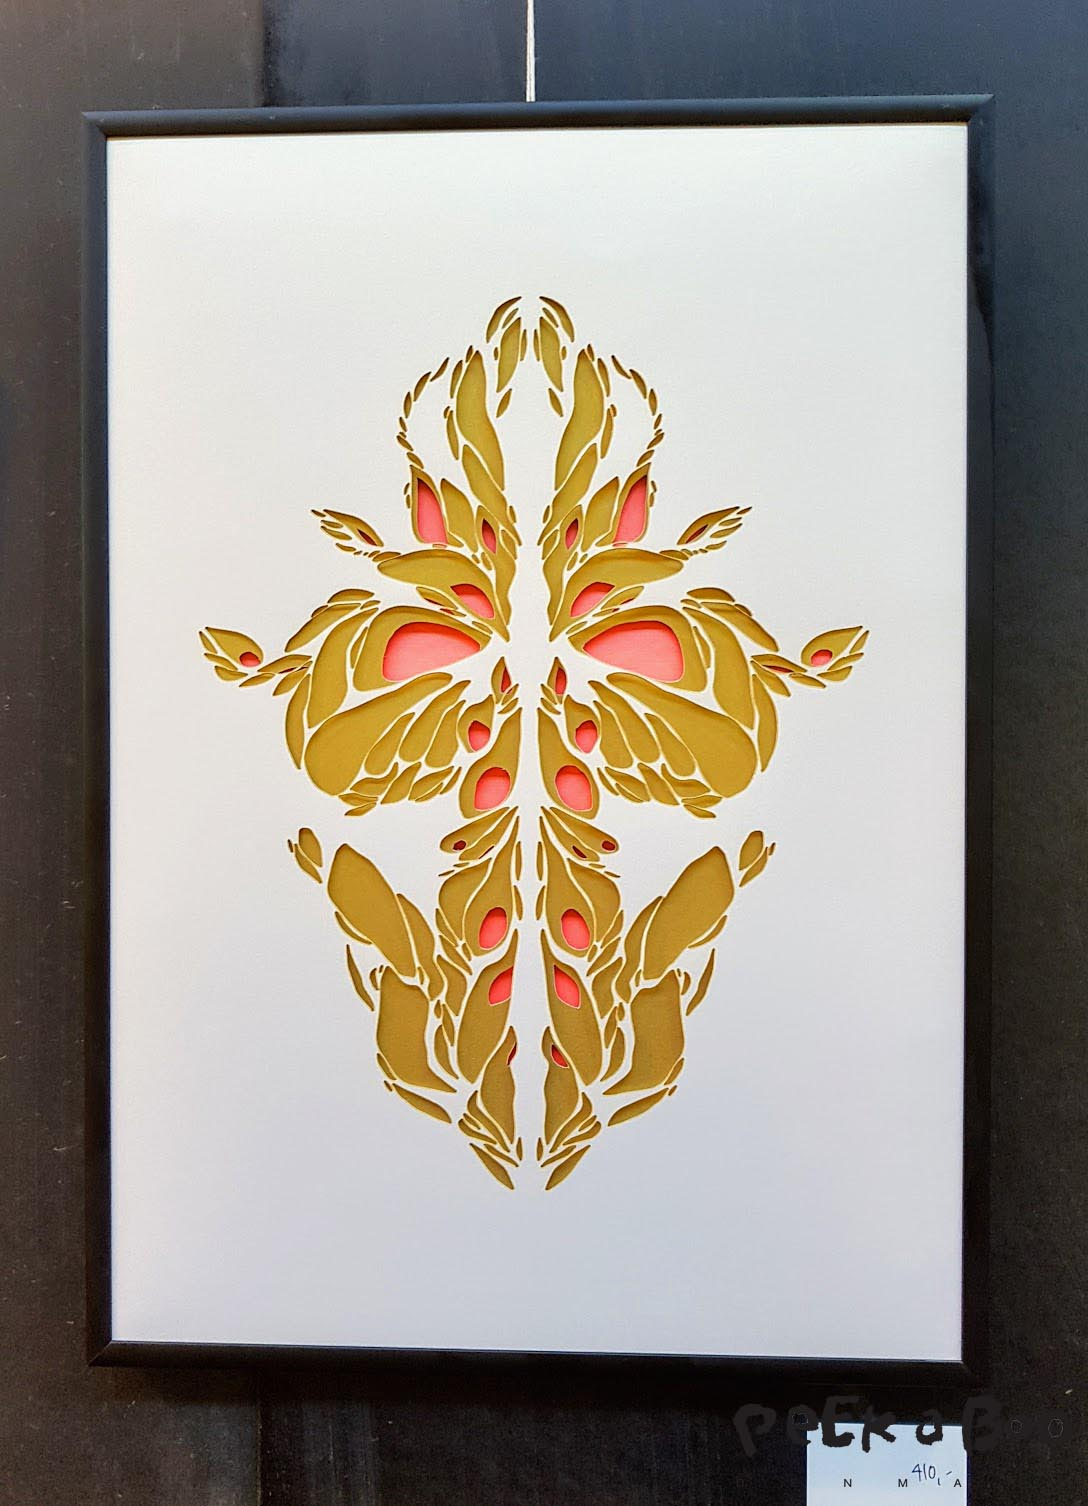 Vicki Zoé unikke kunstværker i papirklip.